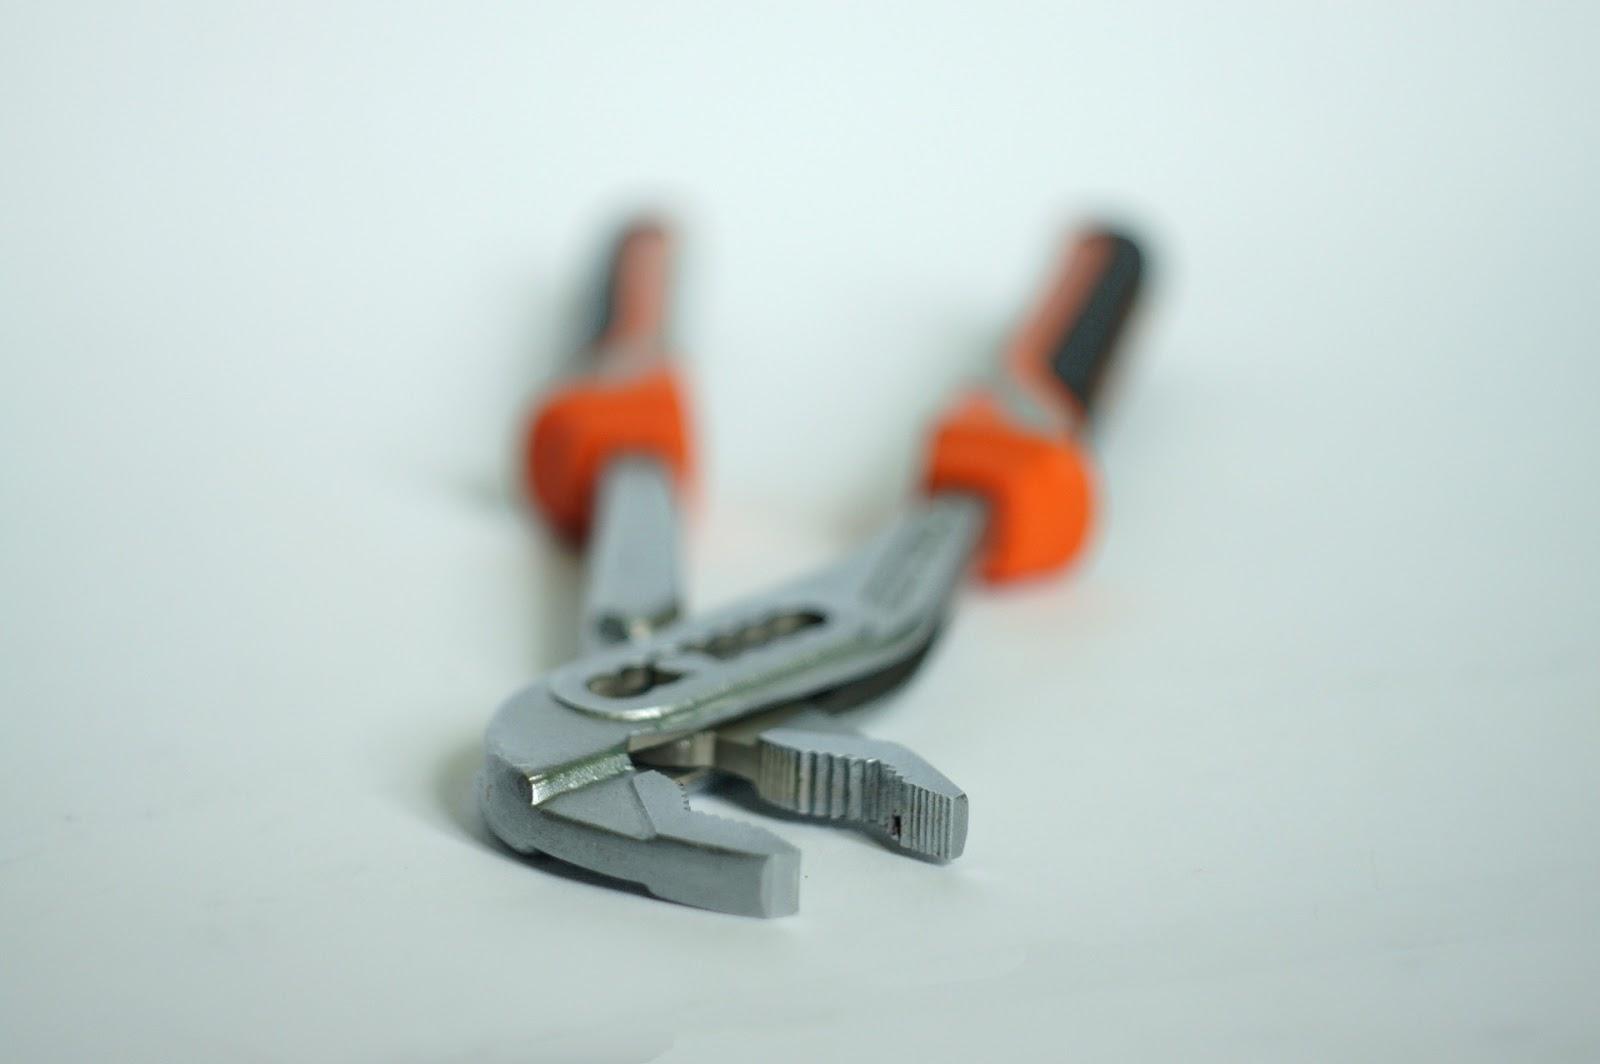 Orange-handled pincers.